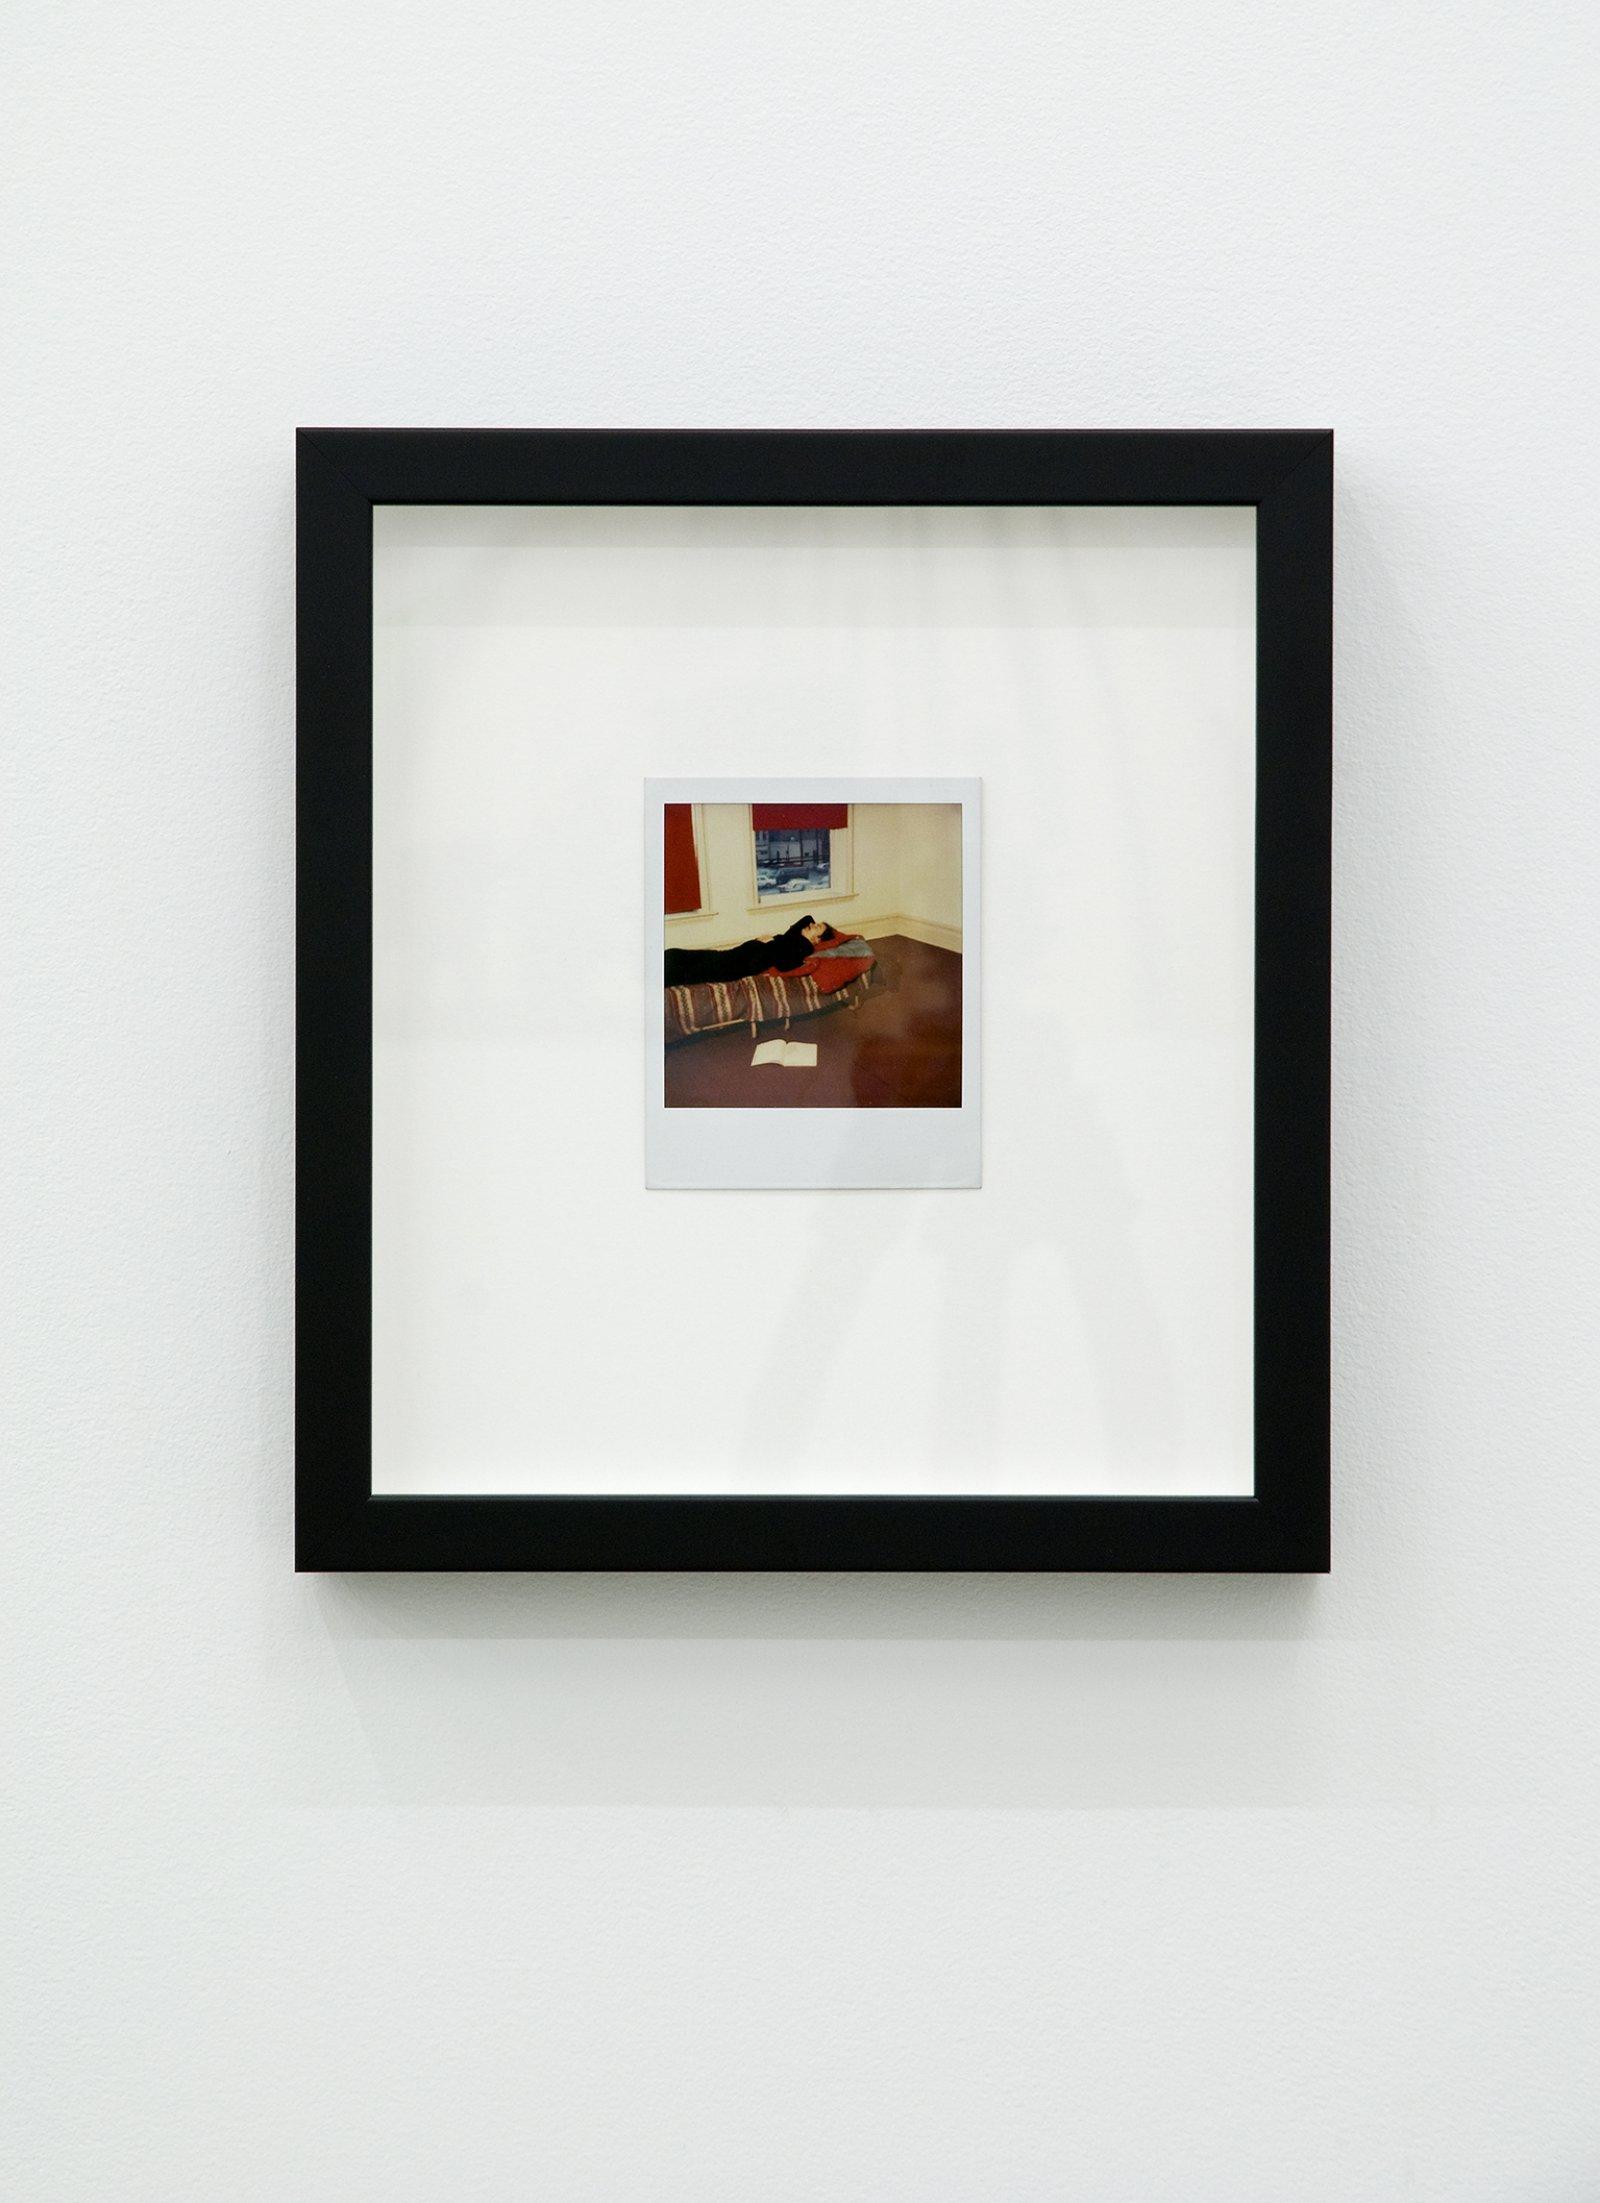 Ian Wallace, Self-Portrait Sleeping, 1979, colour polaroid photograph, 4 x 4 in. (11 x 9 cm) by Ian Wallace